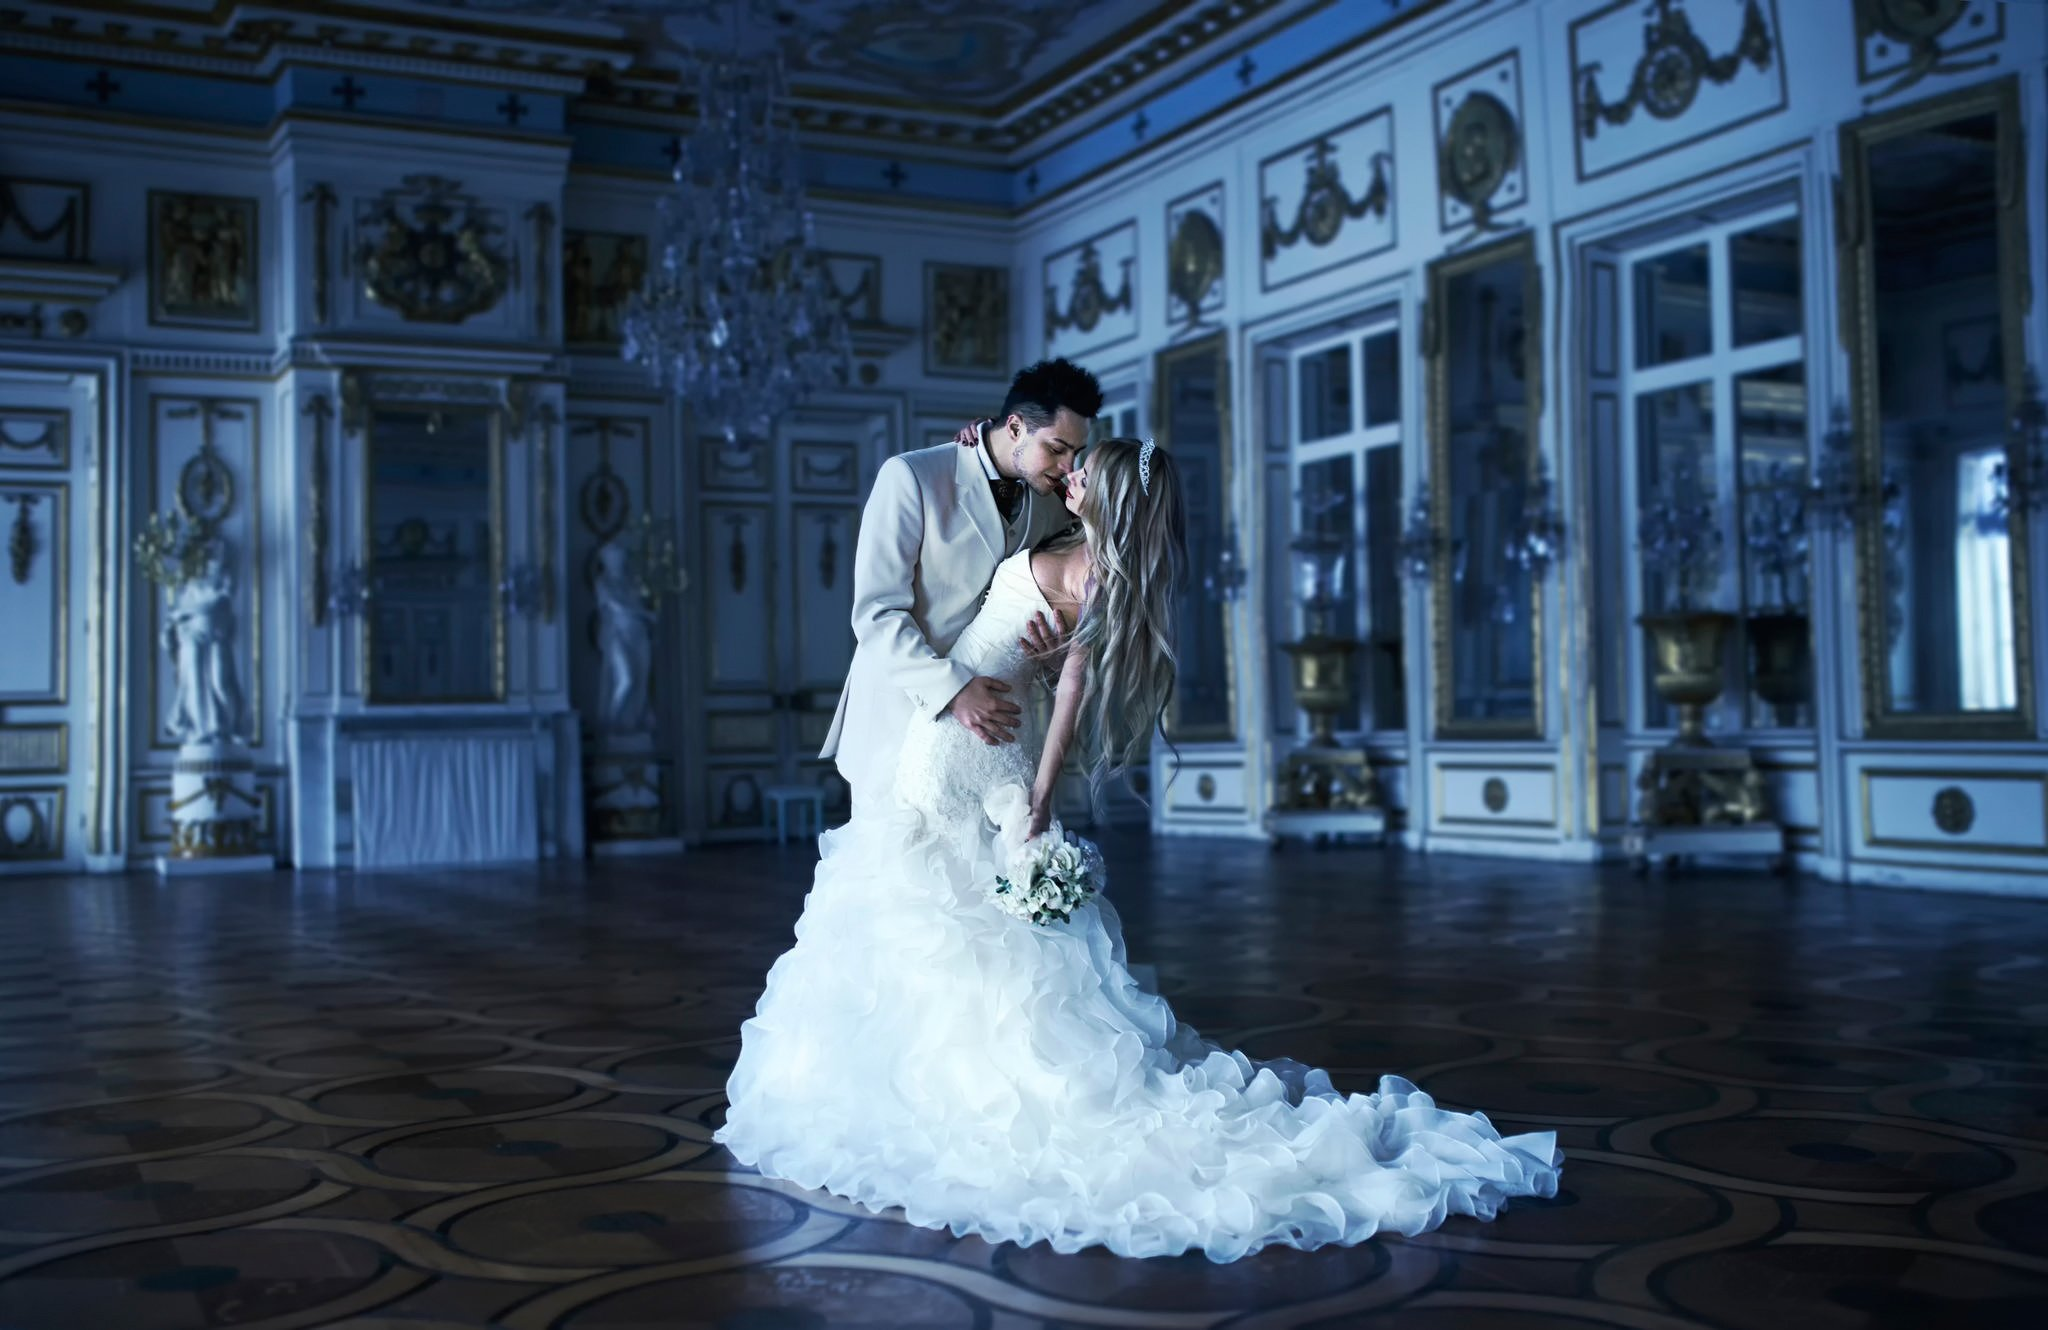 Wedding dance studio baila for Best wedding dresses for dancing